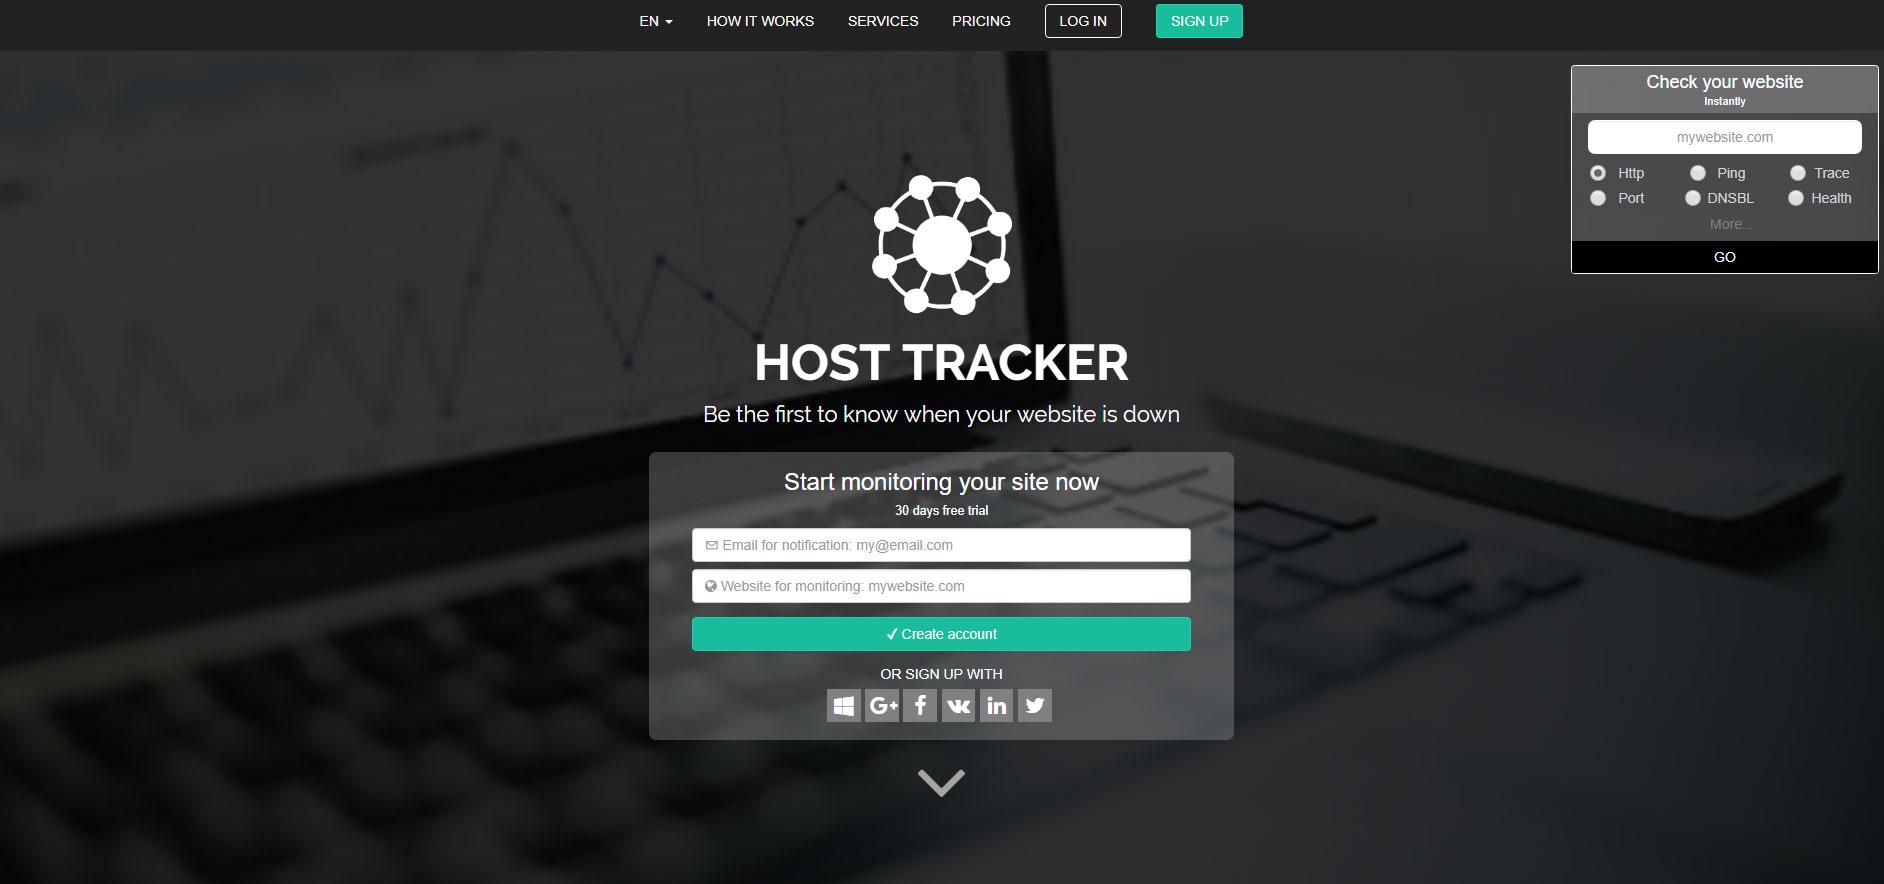 Host-tracker